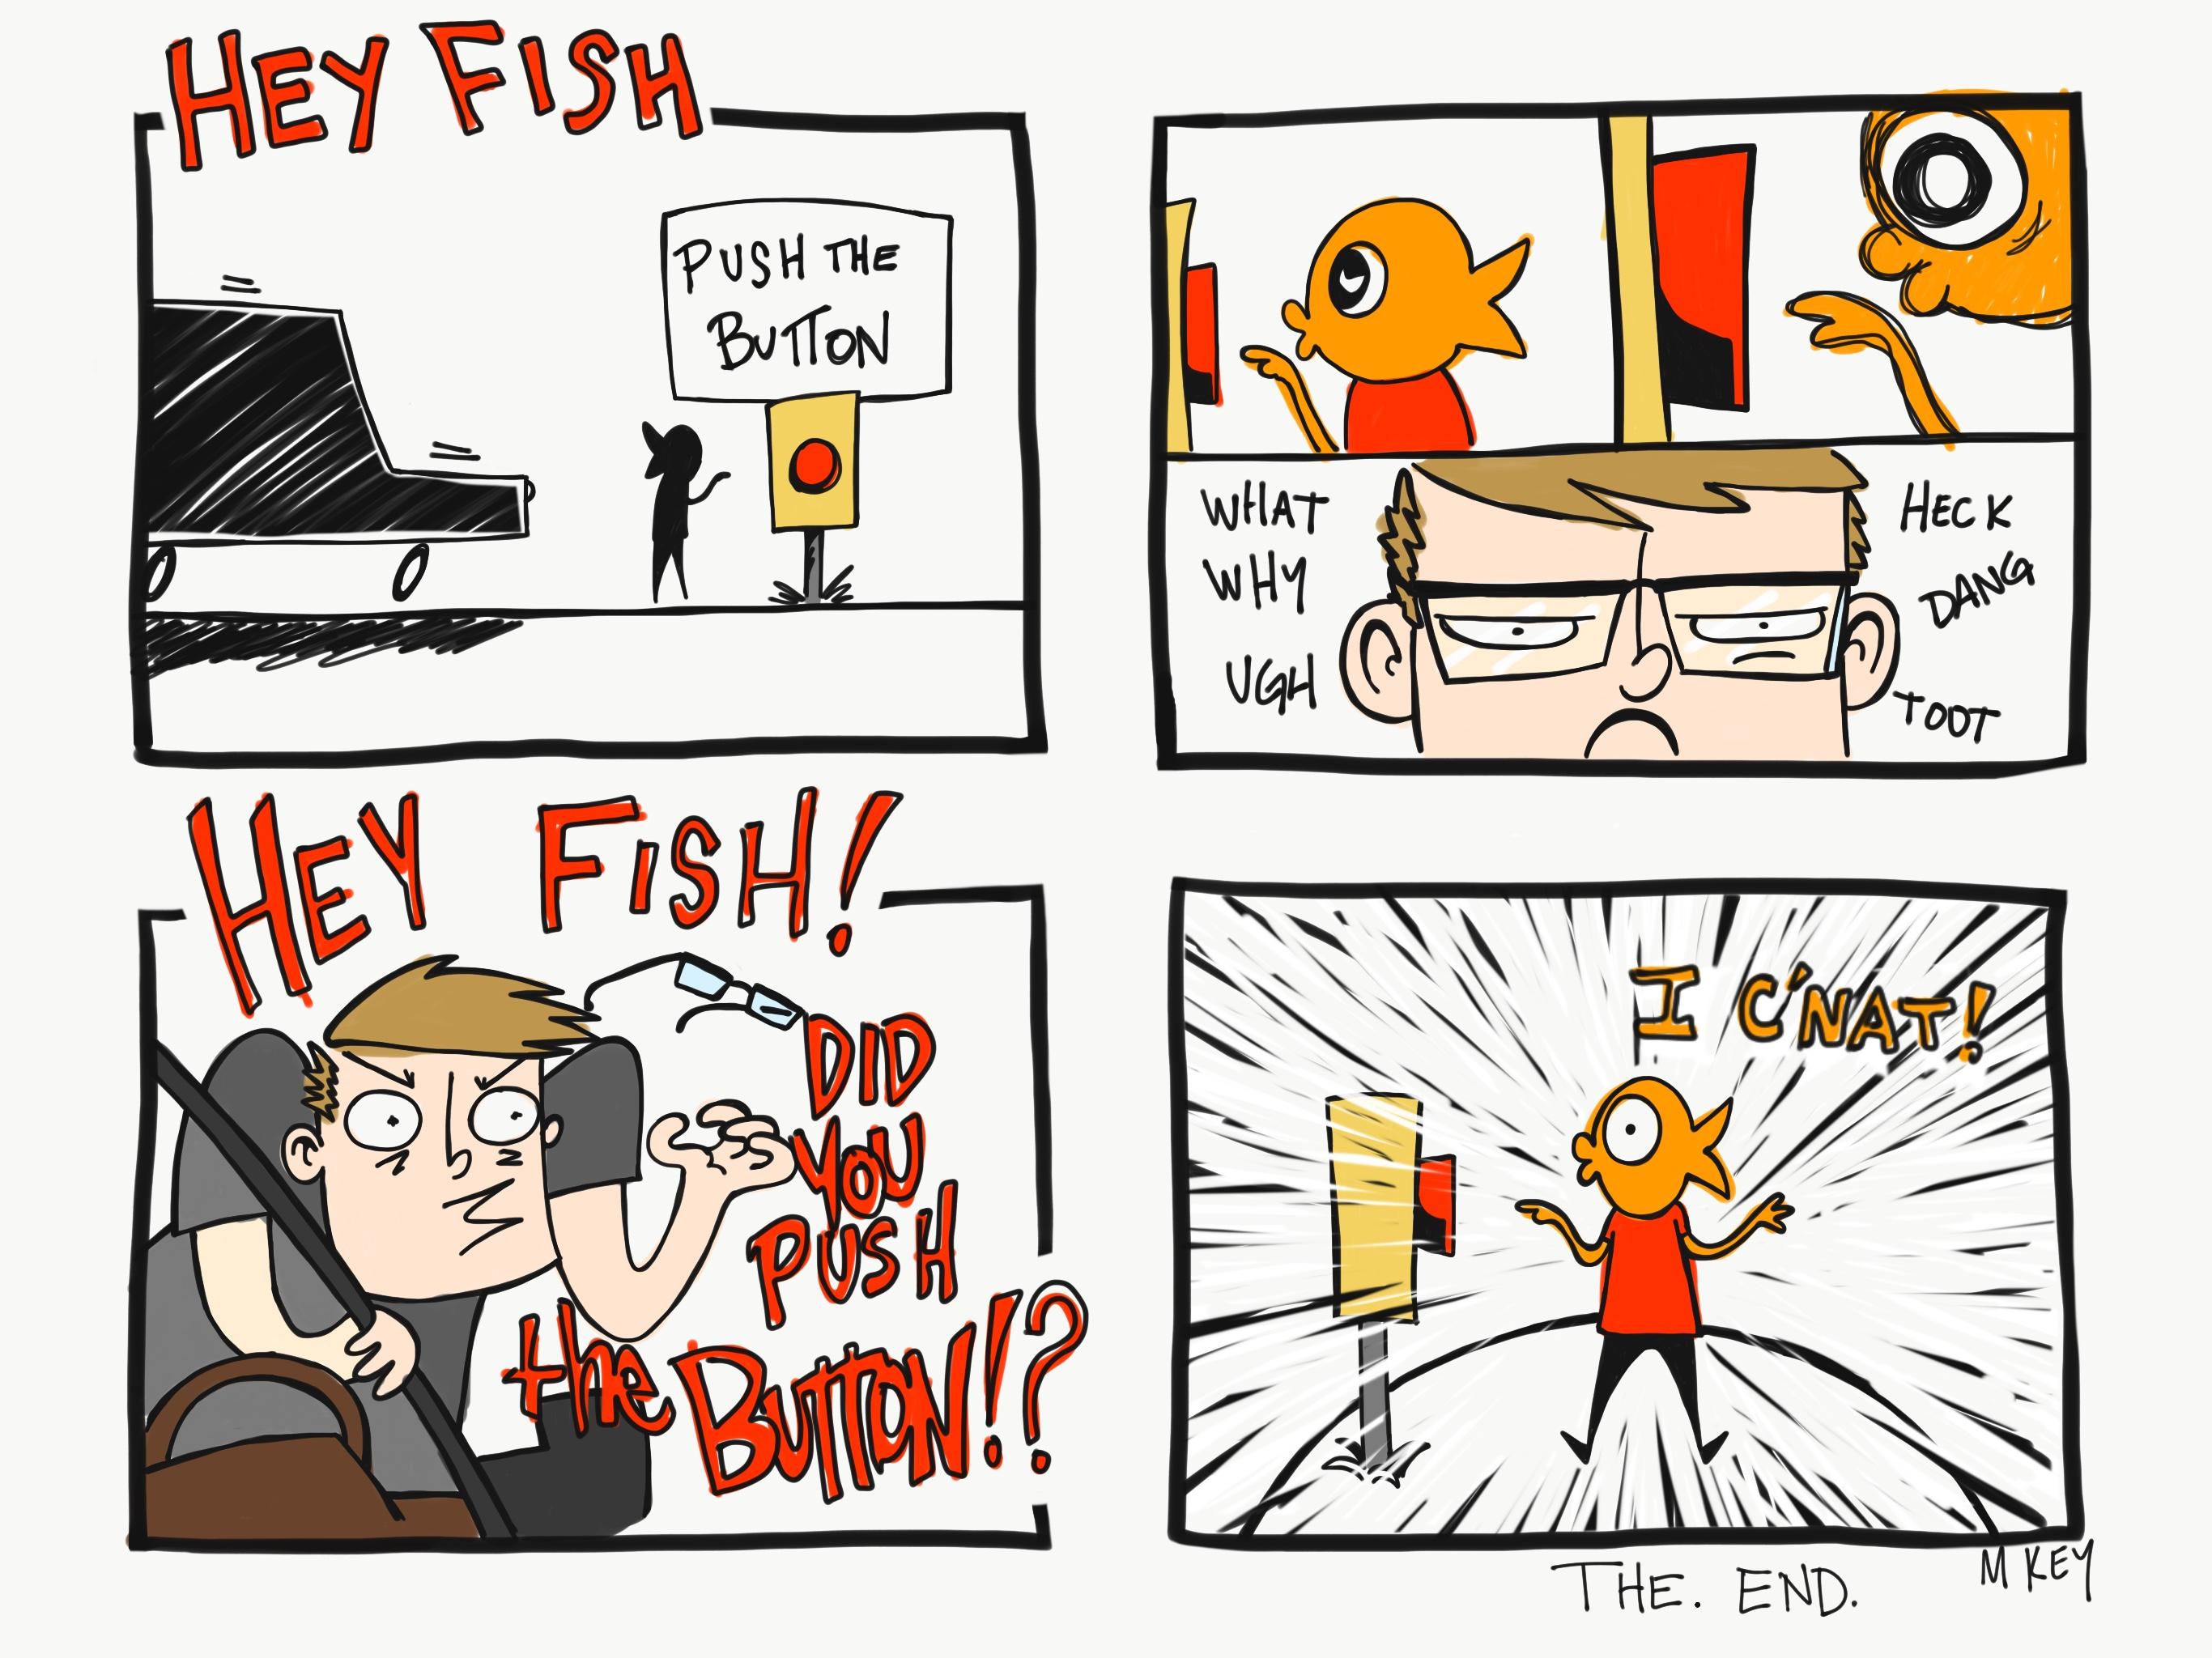 Hey Fish!